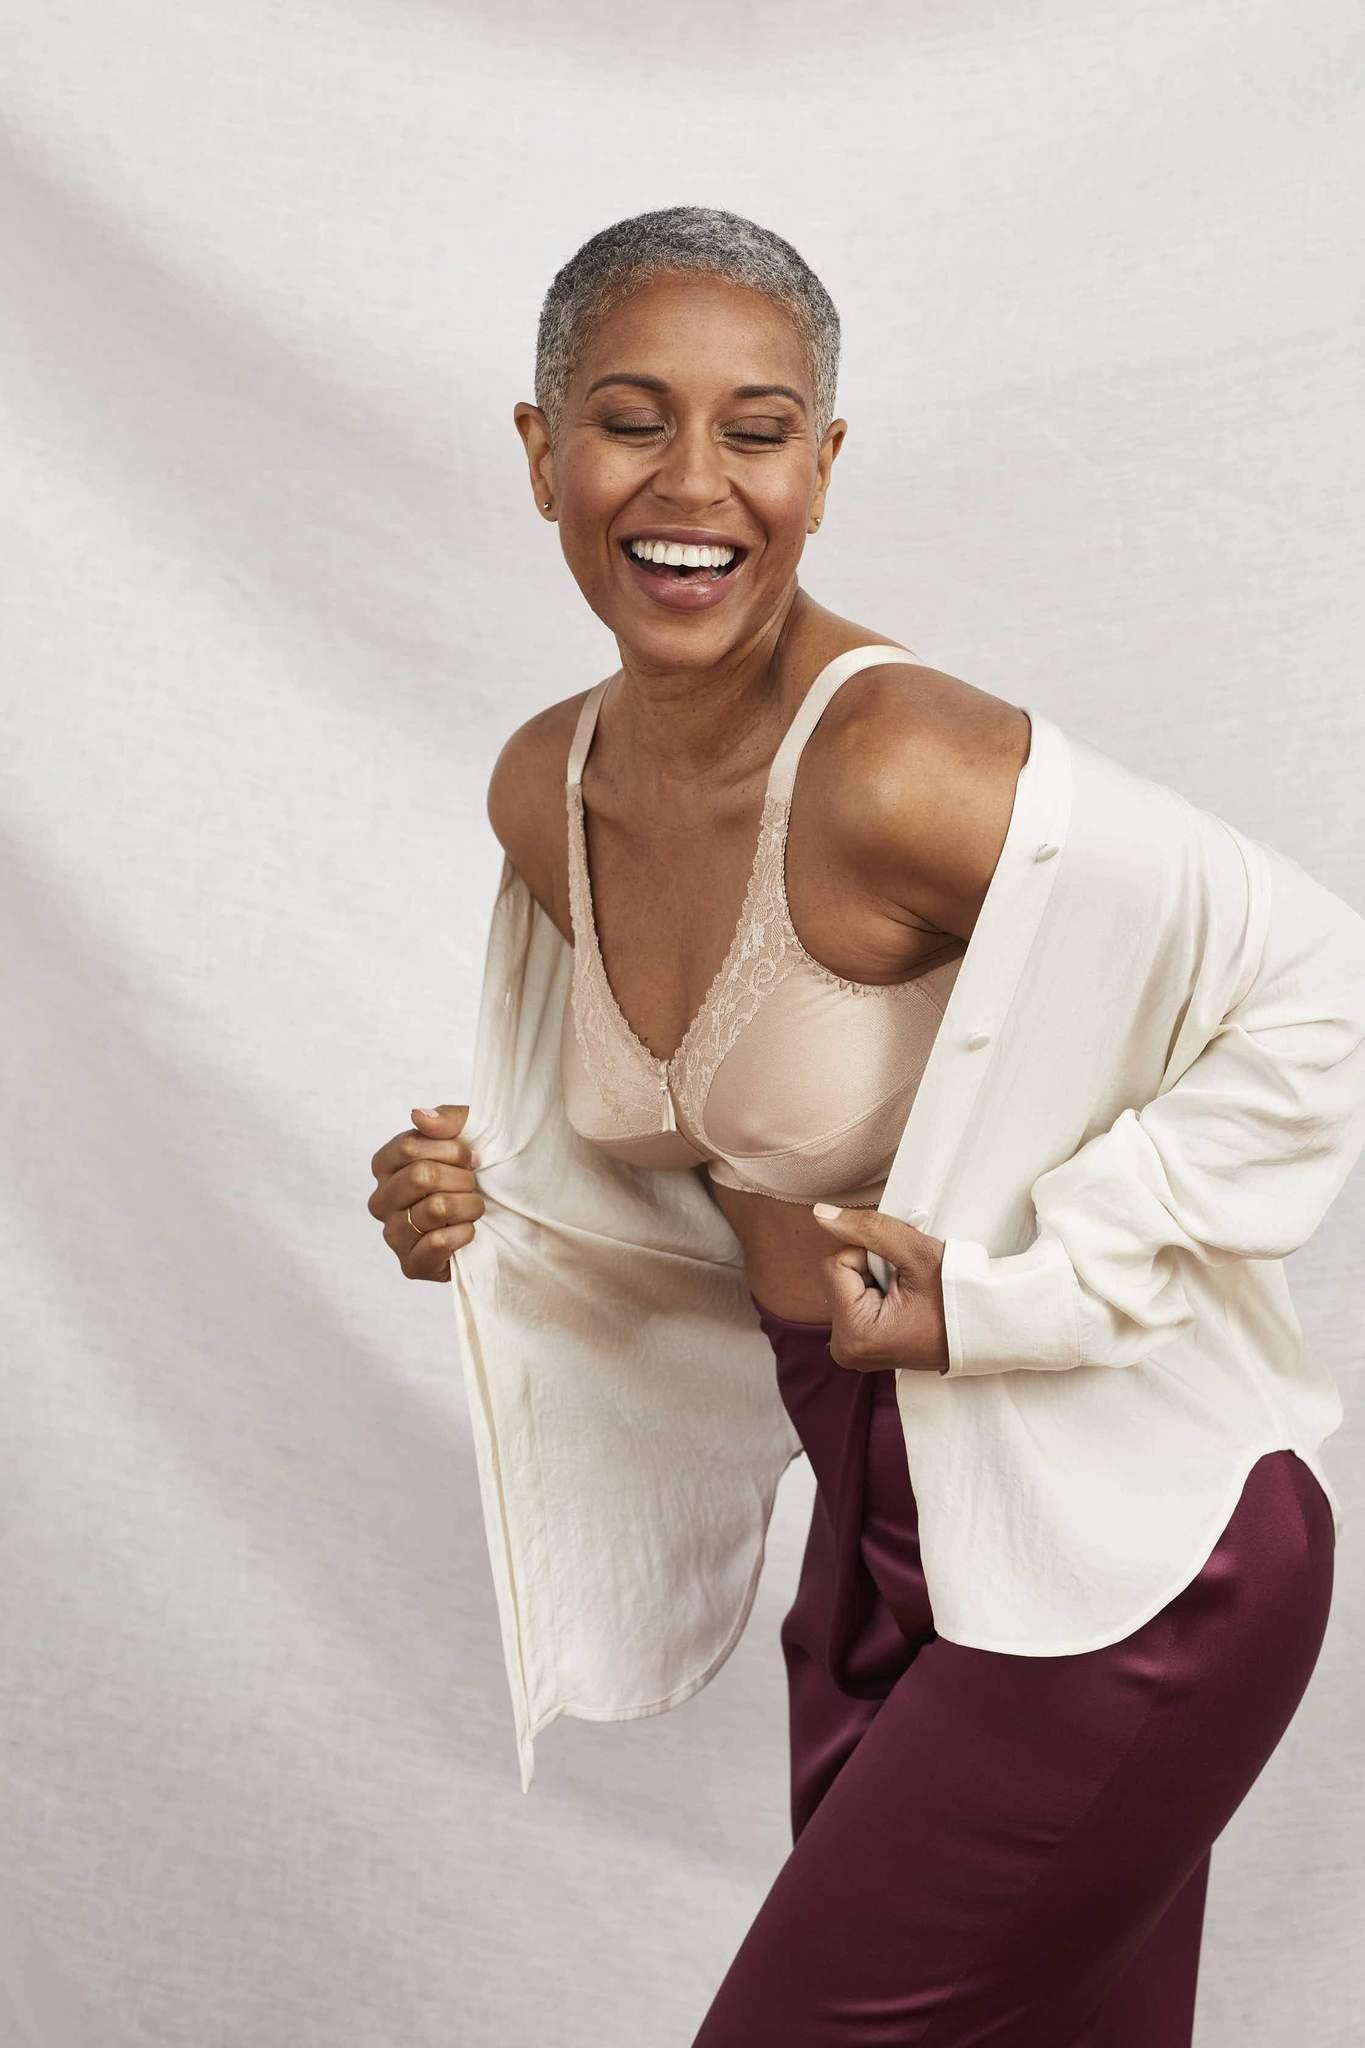 Post-Mastectomy Bra Brand 'Myya' launches